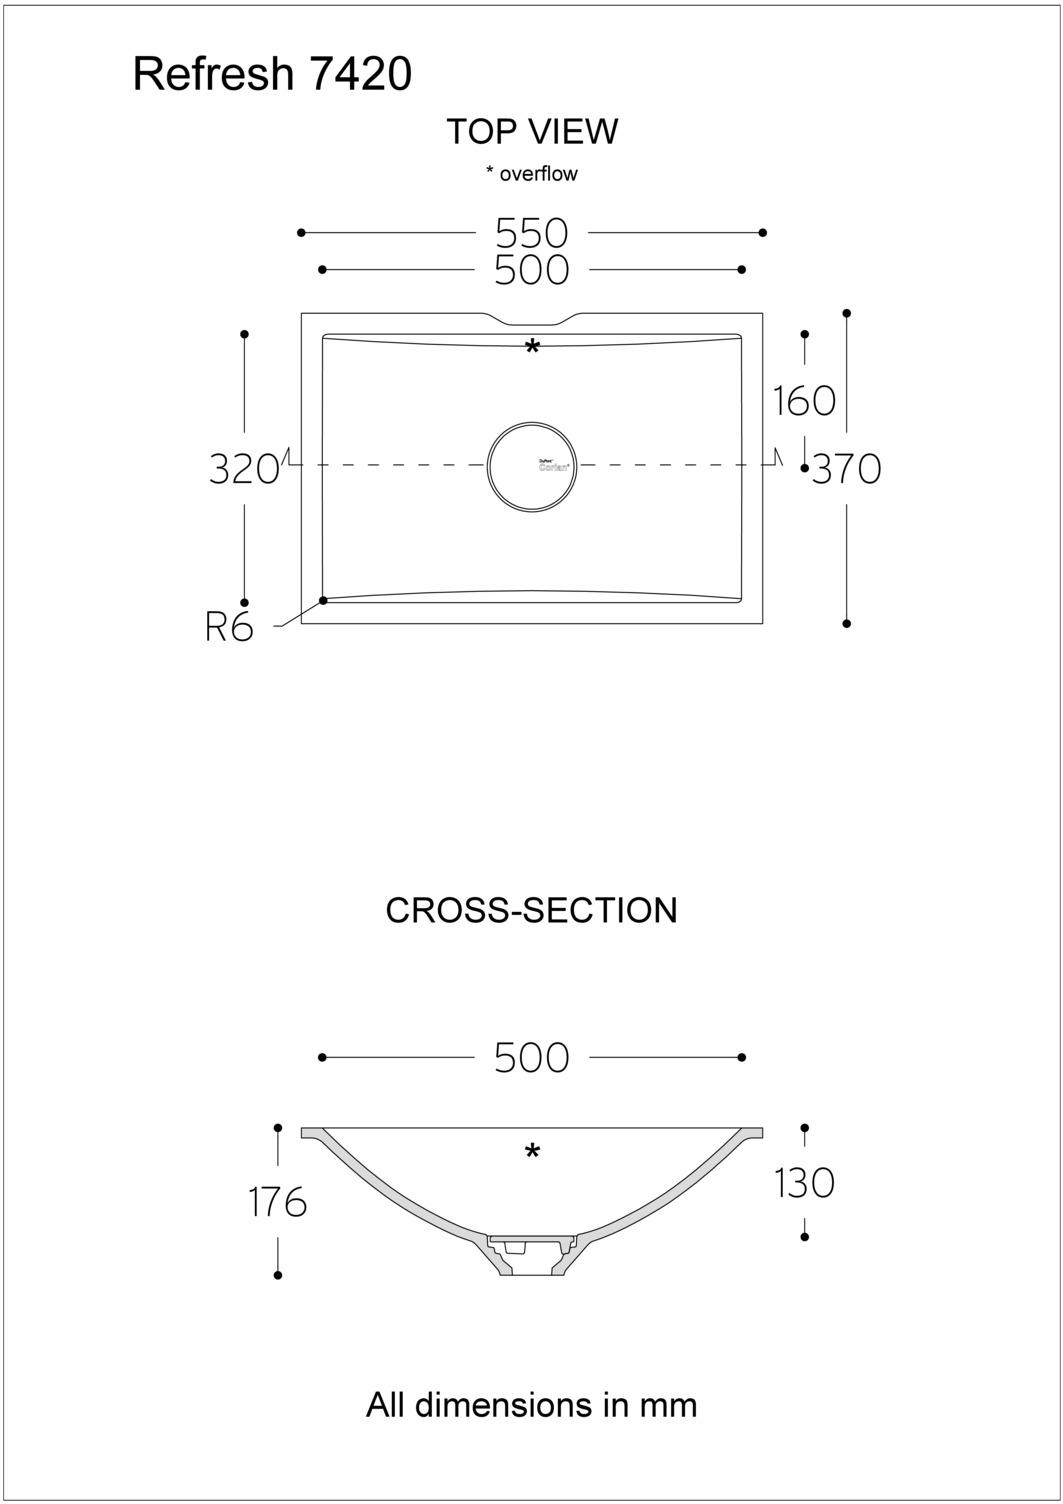 DUPONT_CORIAN_REFRESH7420_2D_PDF[0]